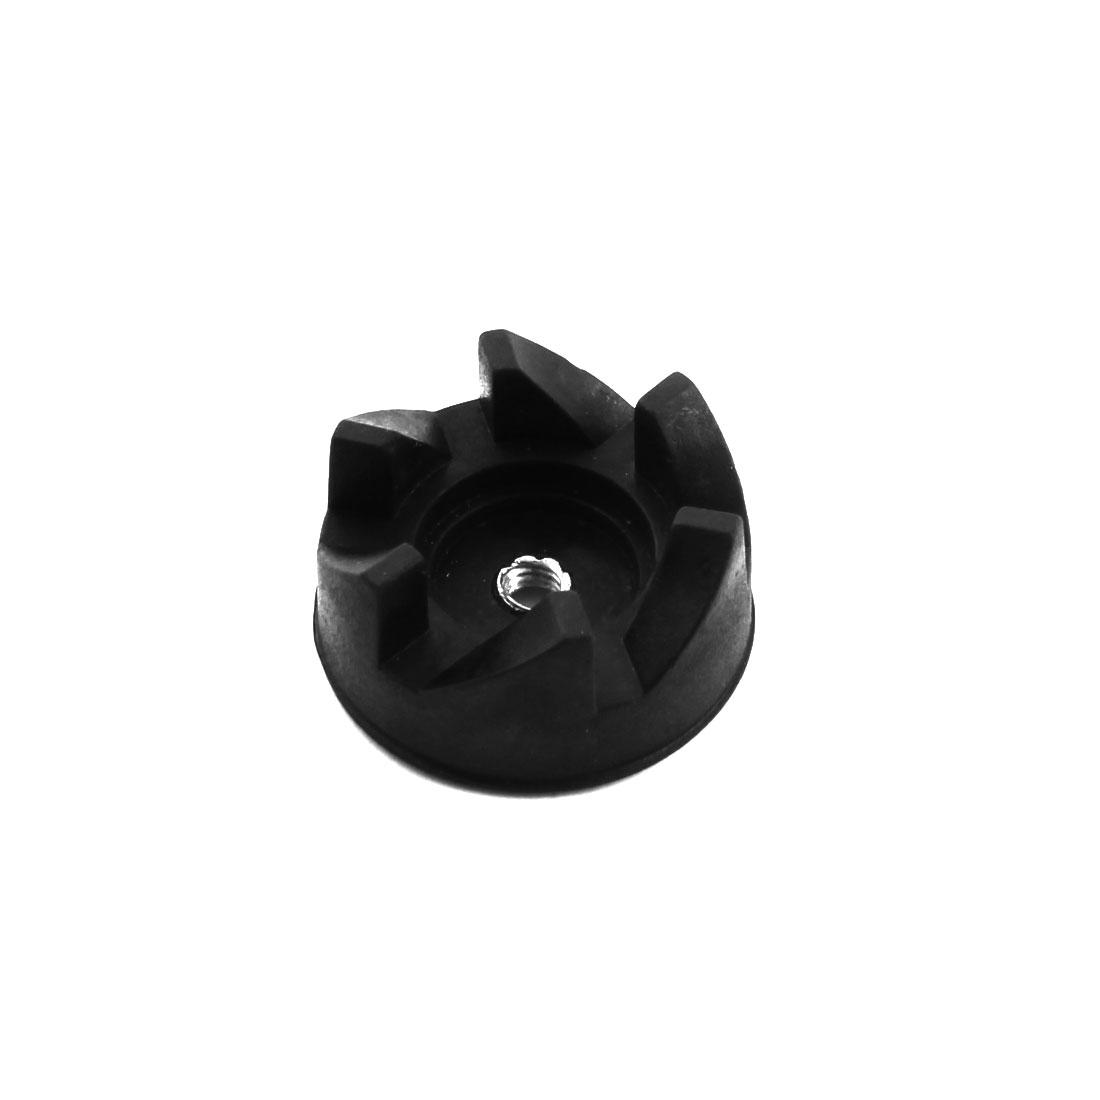 Kitchen Blender Part 6 Teeth Black Rubber Coupler Drive Clutch Gear 34mm Dia